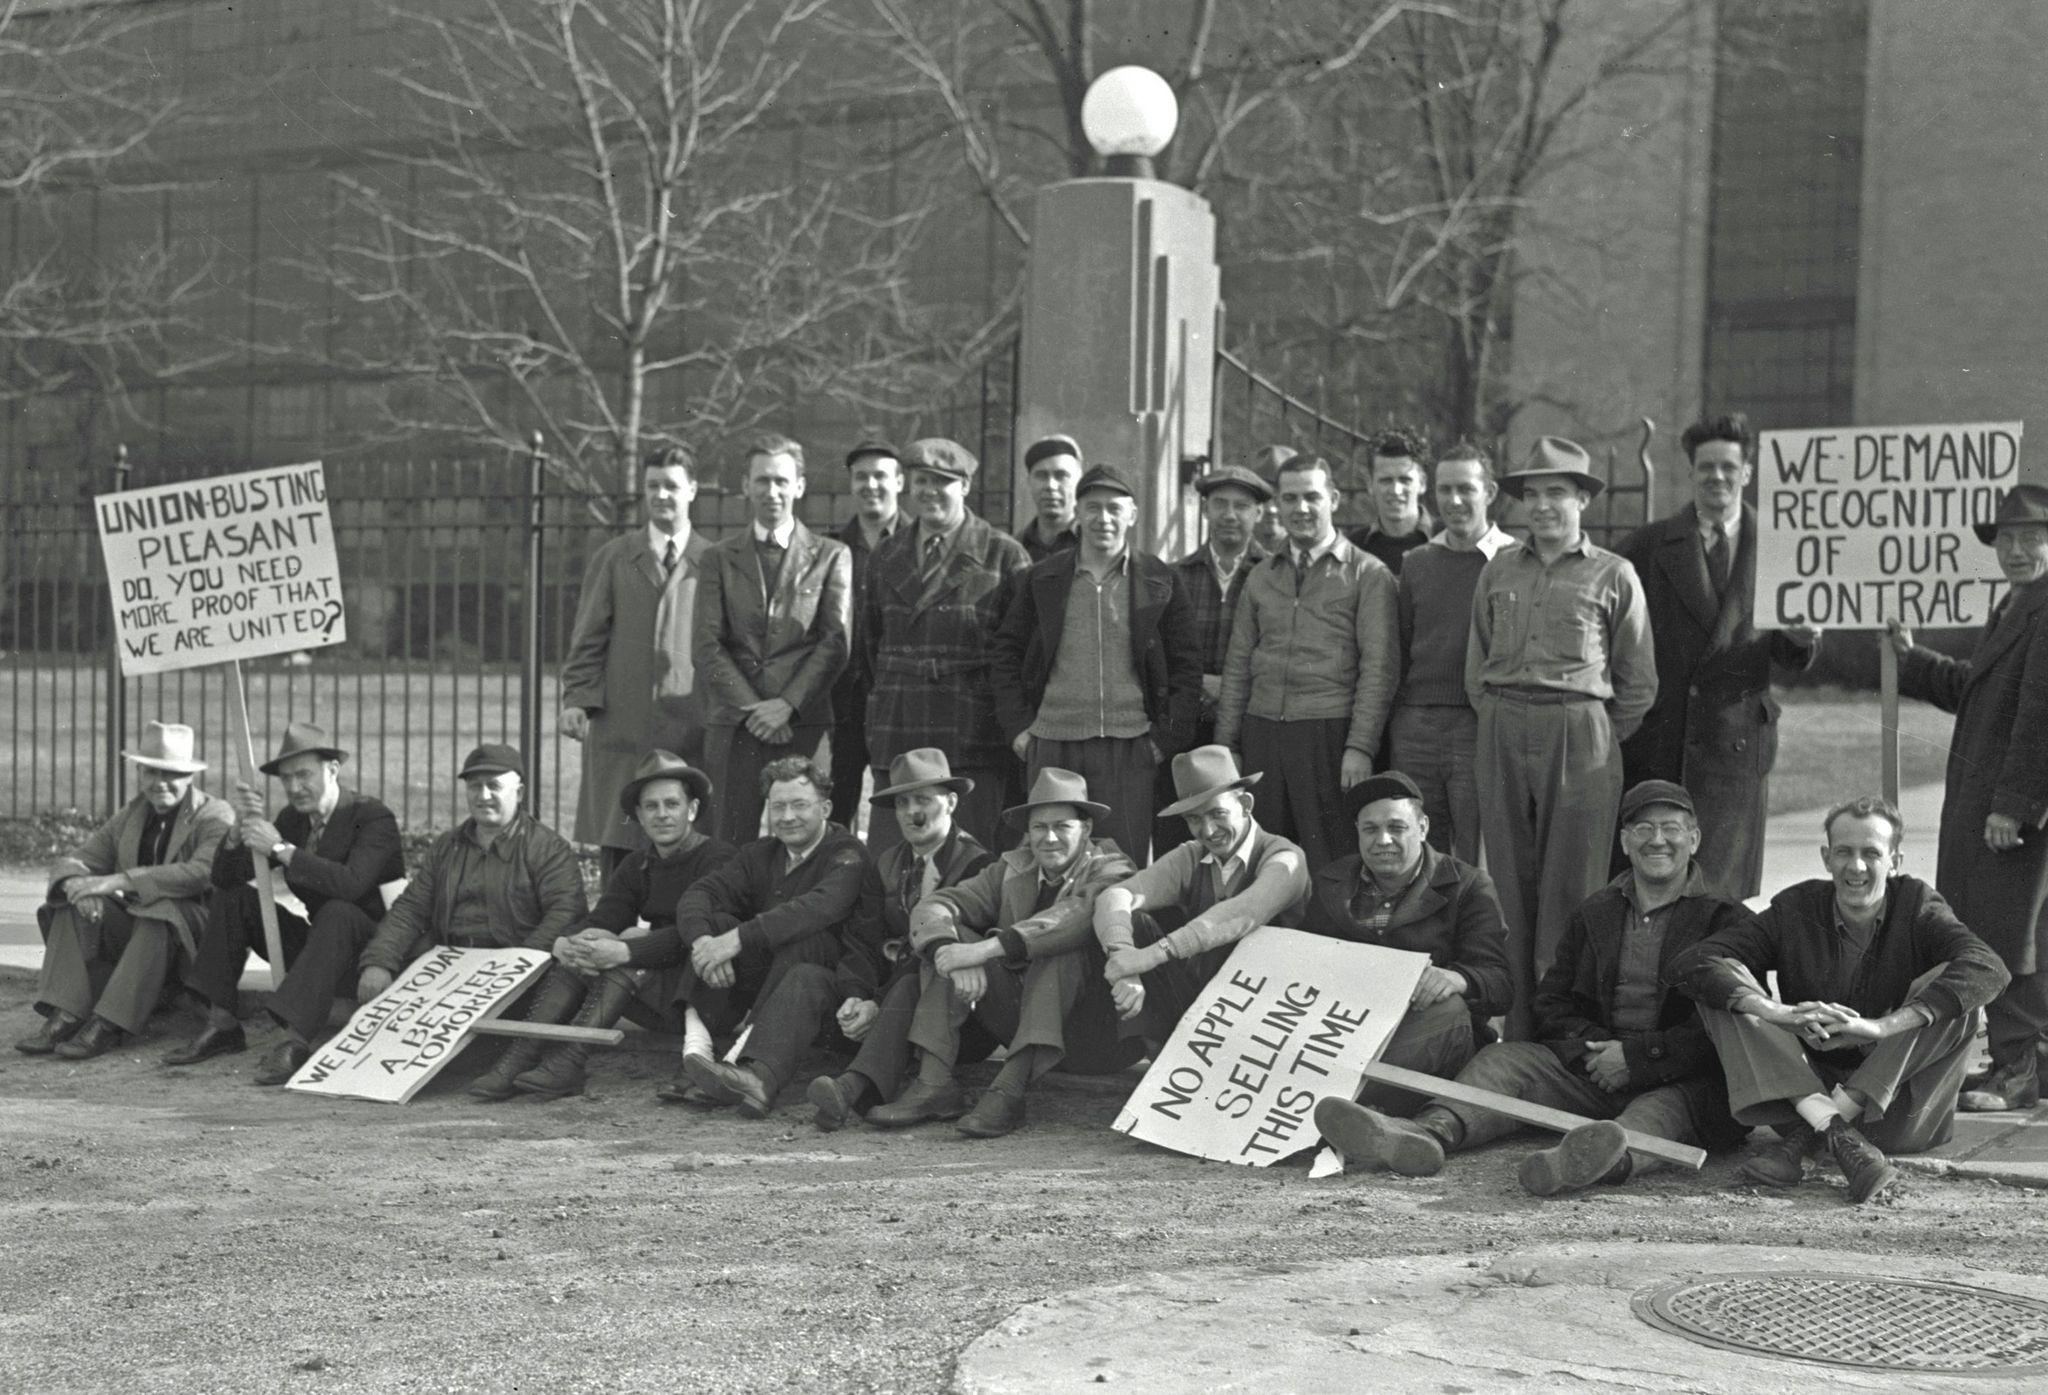 gm-strike-1946jpg-4fbfafe88d242d5d